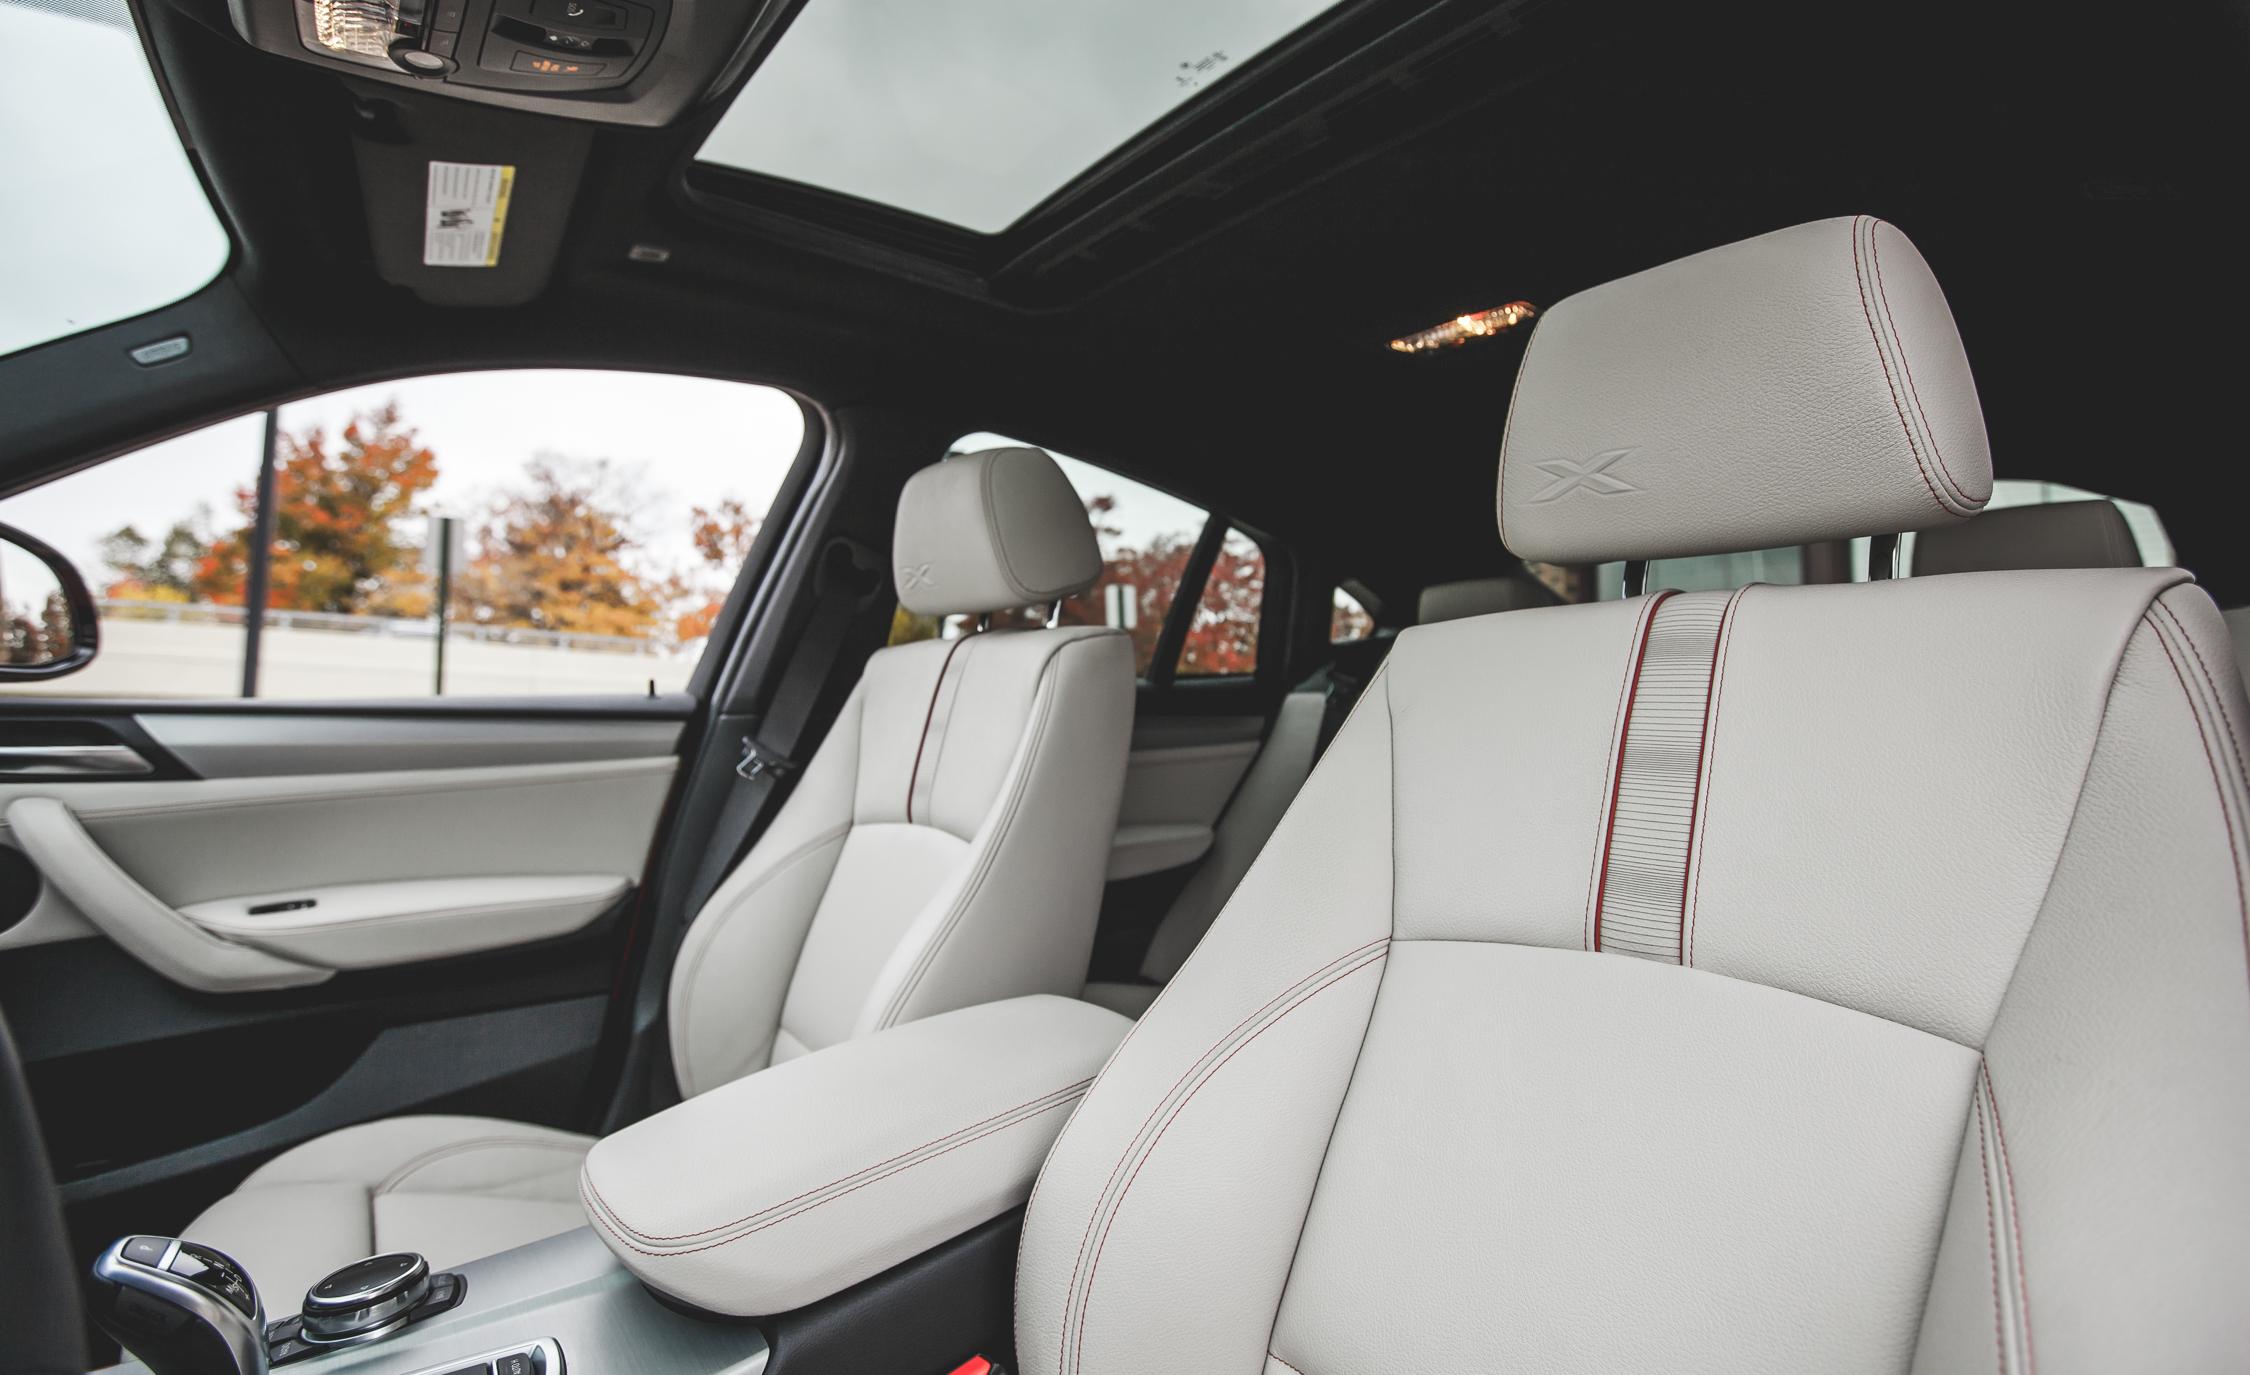 2015 BMW X4 XDrive28i Interior (Photo 13 of 29)